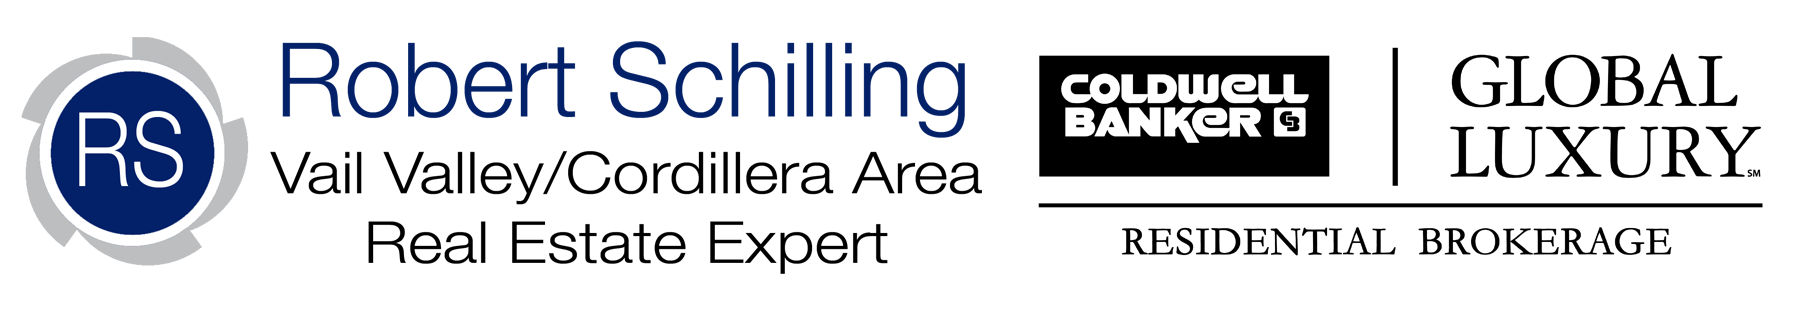 Robert Schilling Real Estate